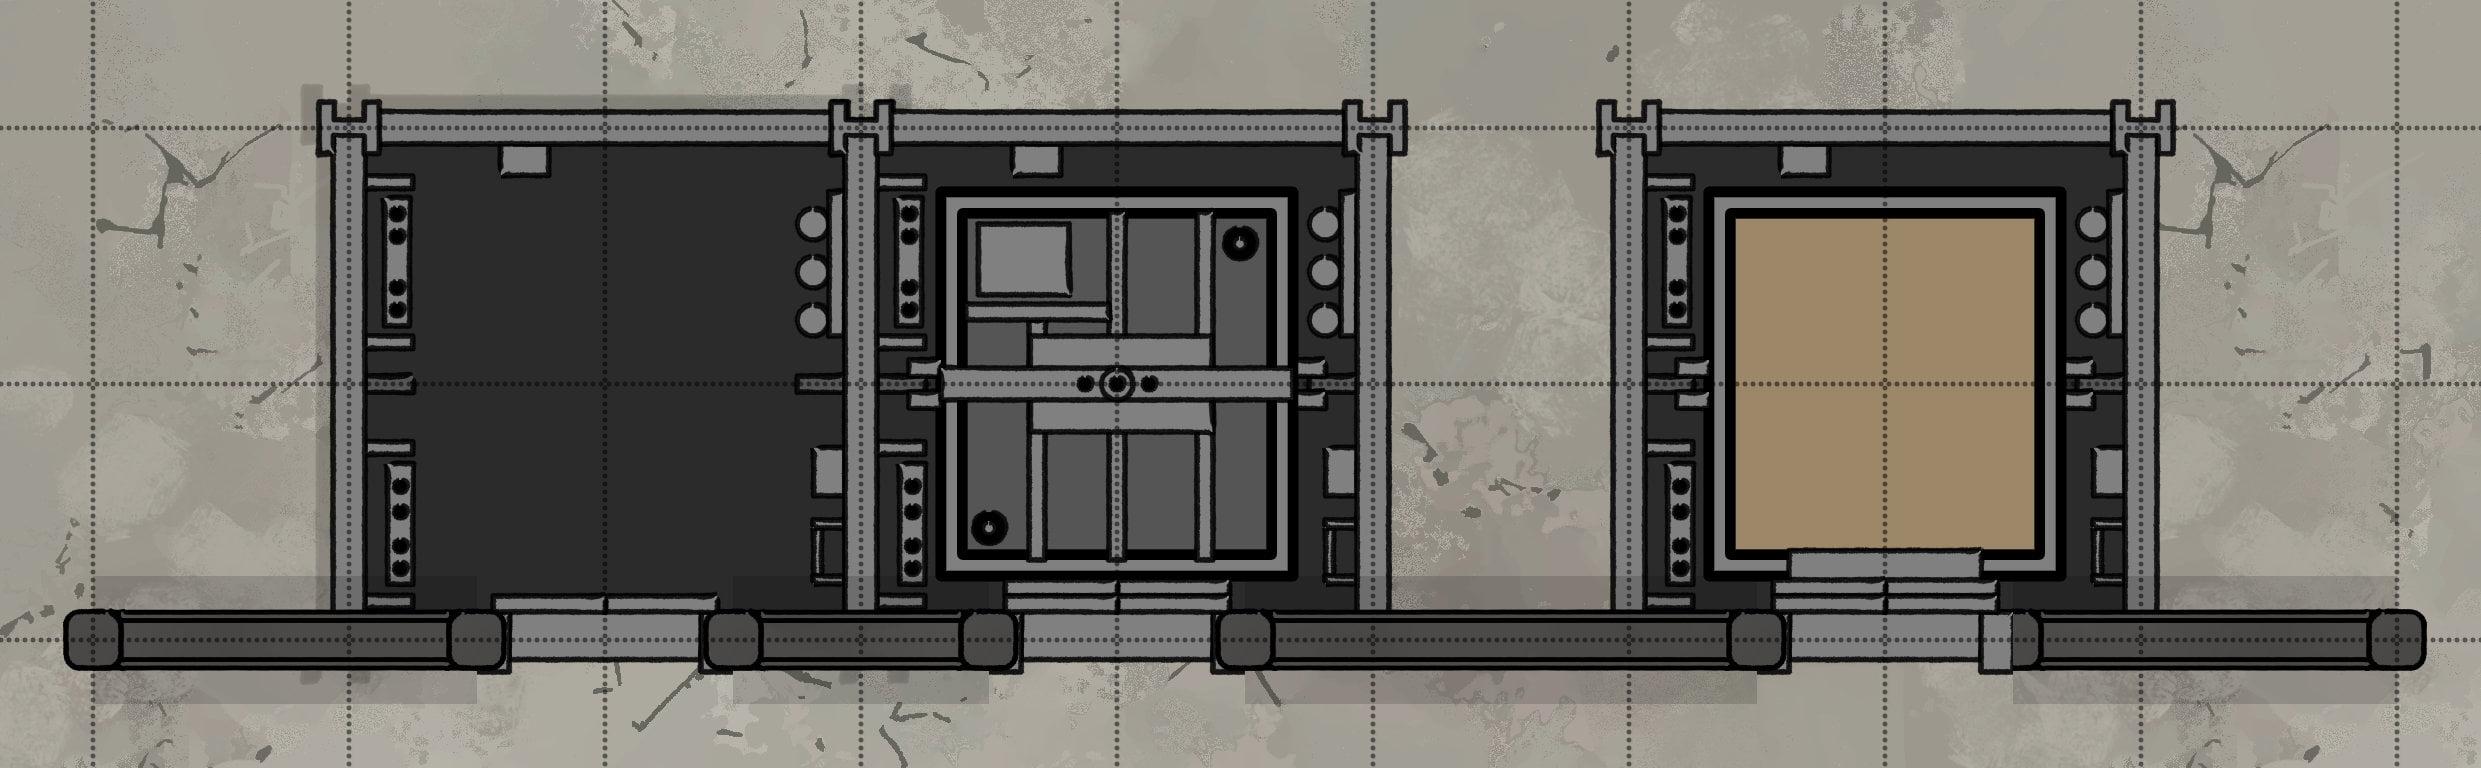 Elevators02